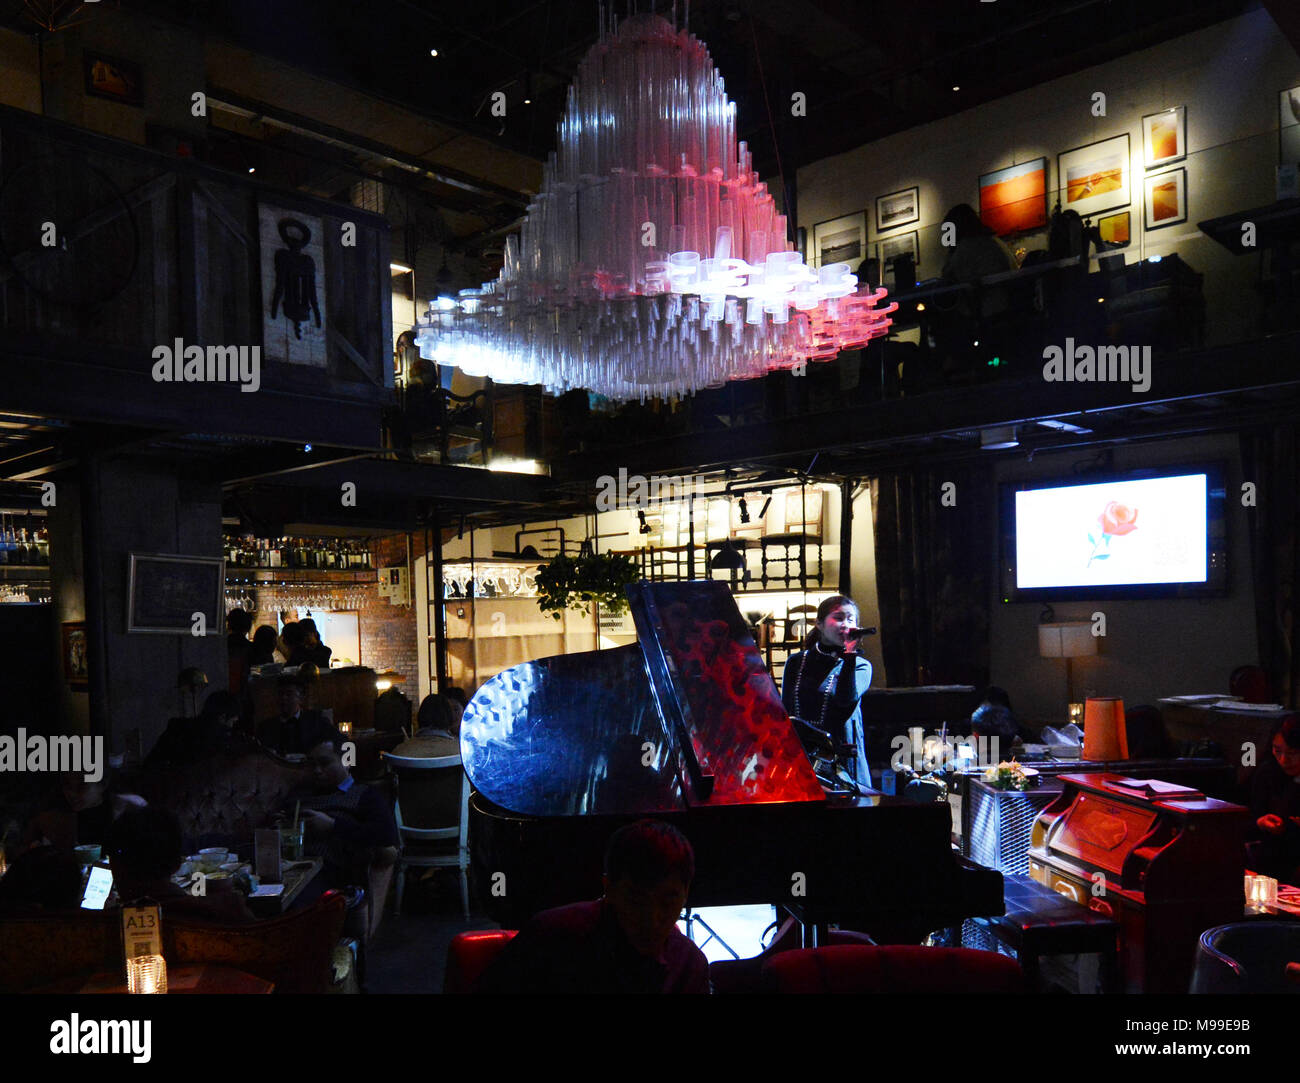 A Jazz bar in Shenzhen's Futian district. - Stock Image